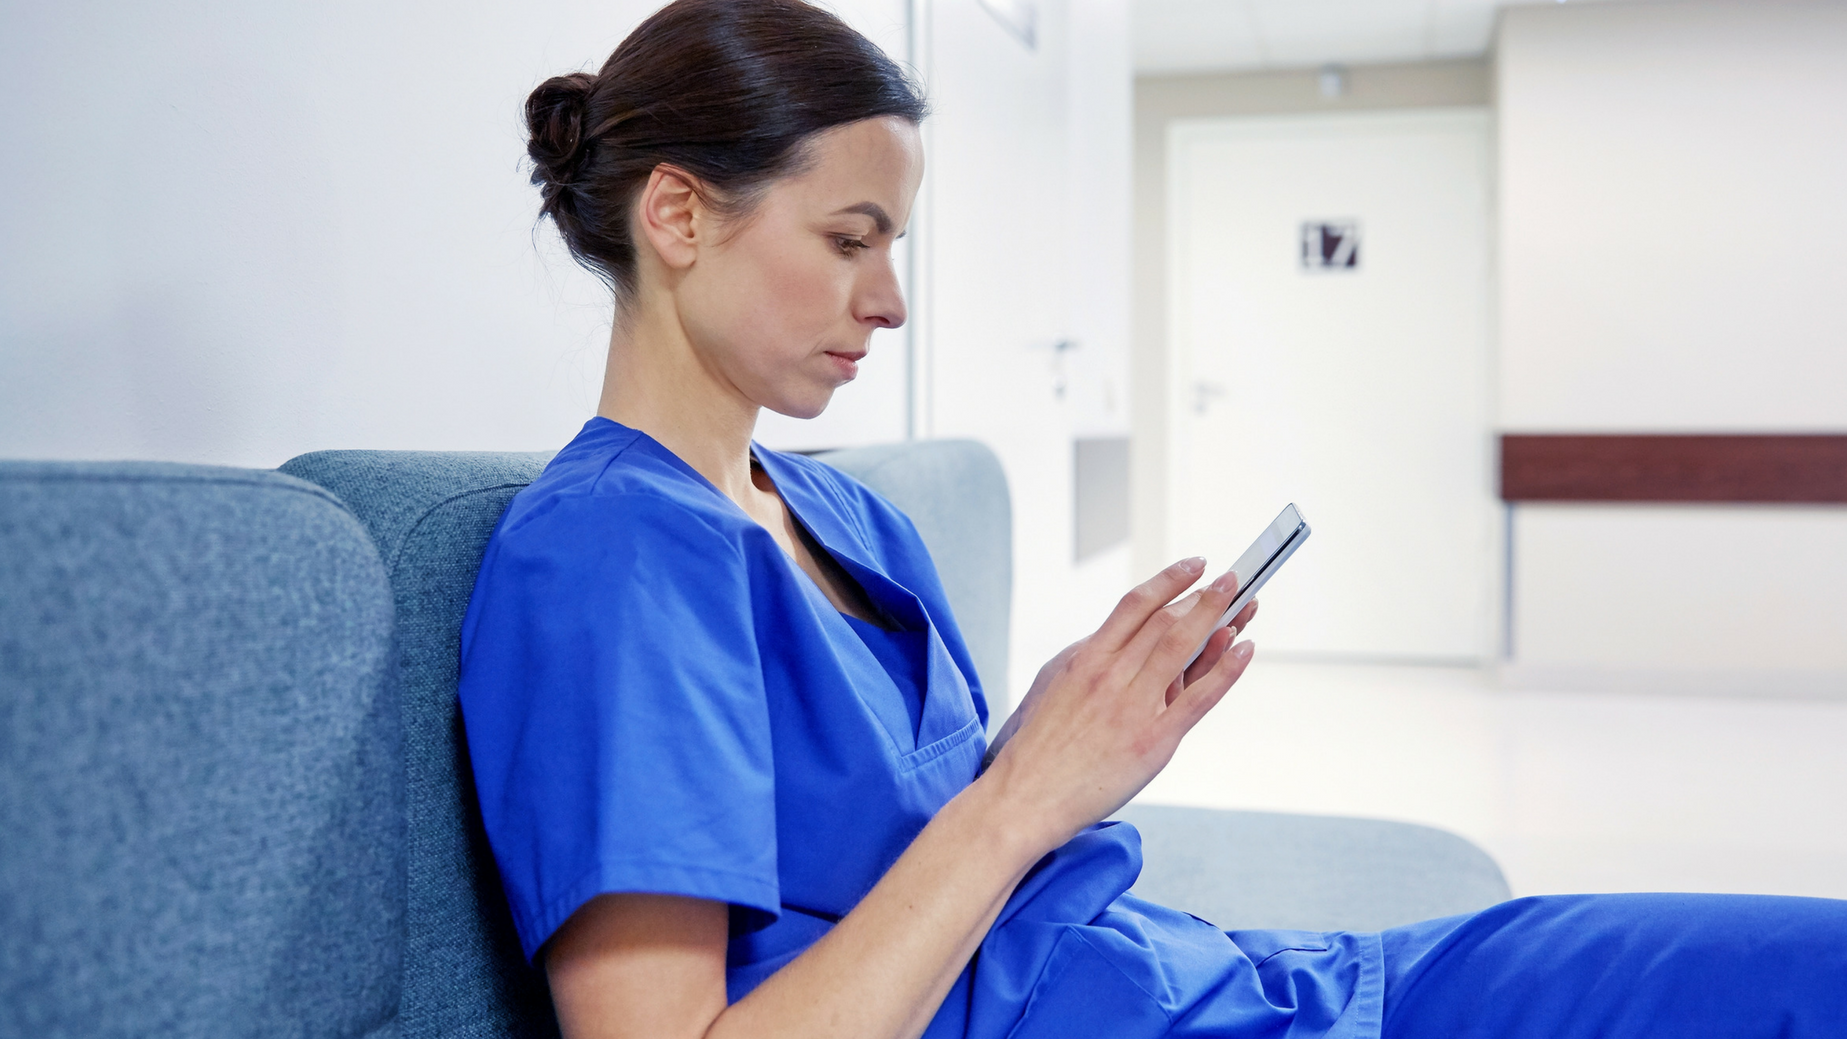 nurse on phone.png